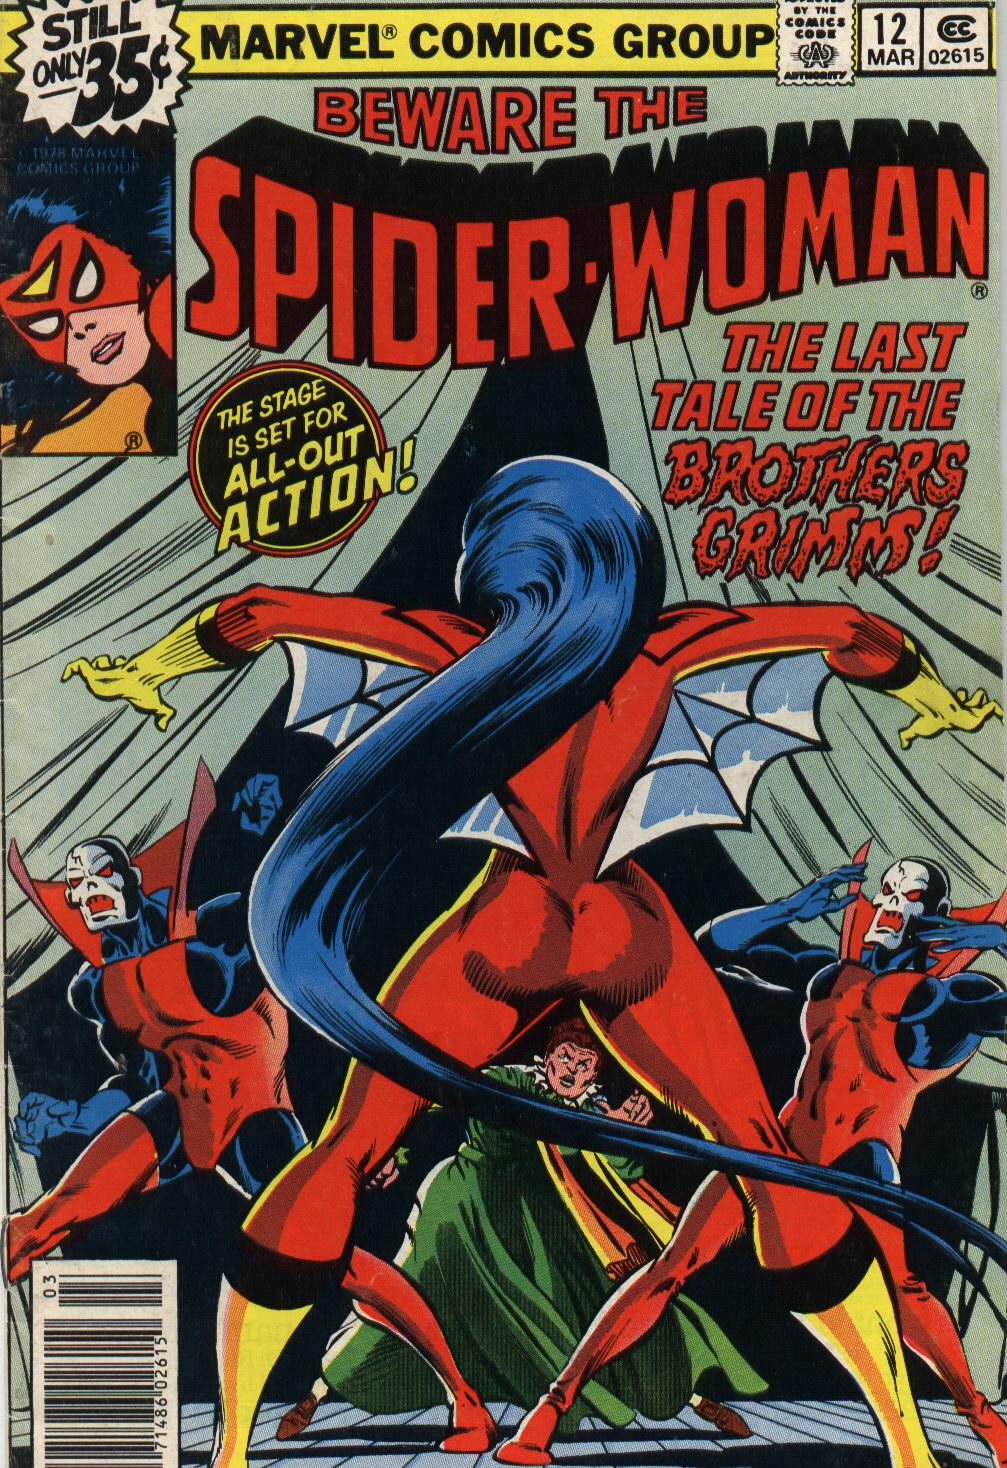 Spider-Woman (1978) #12 #39 - English 1